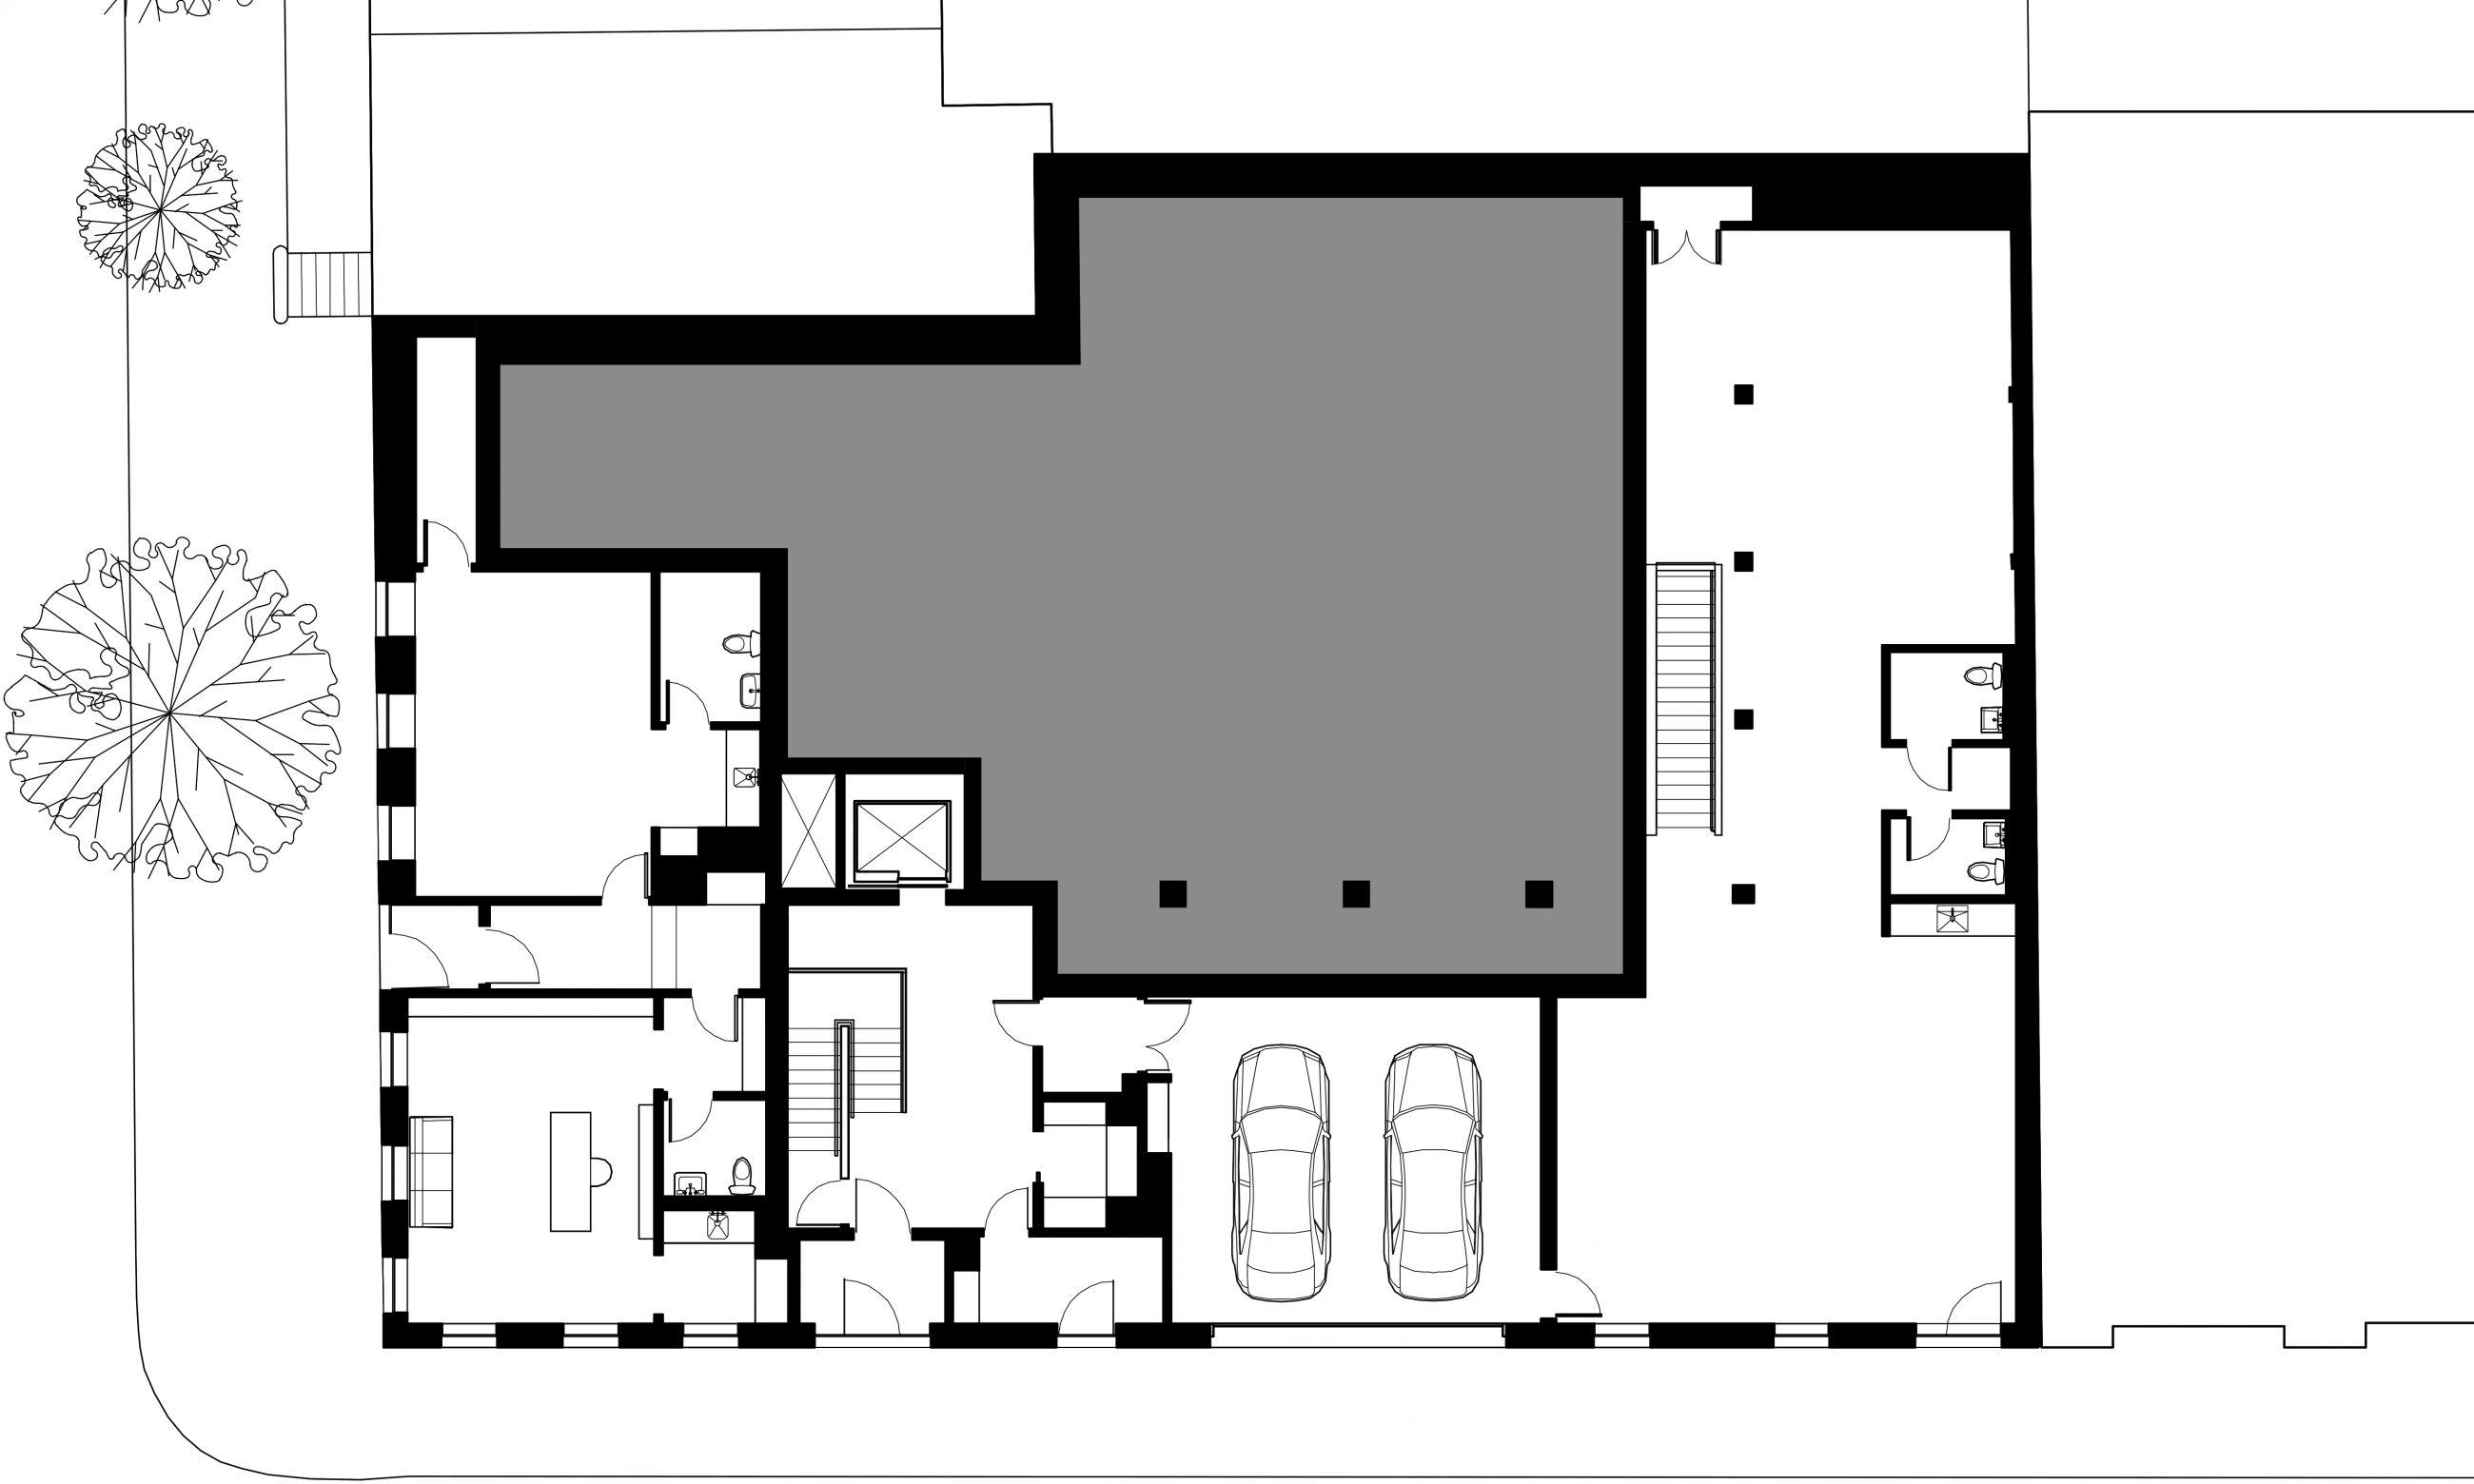 West Village Residence 1st Floor Plan